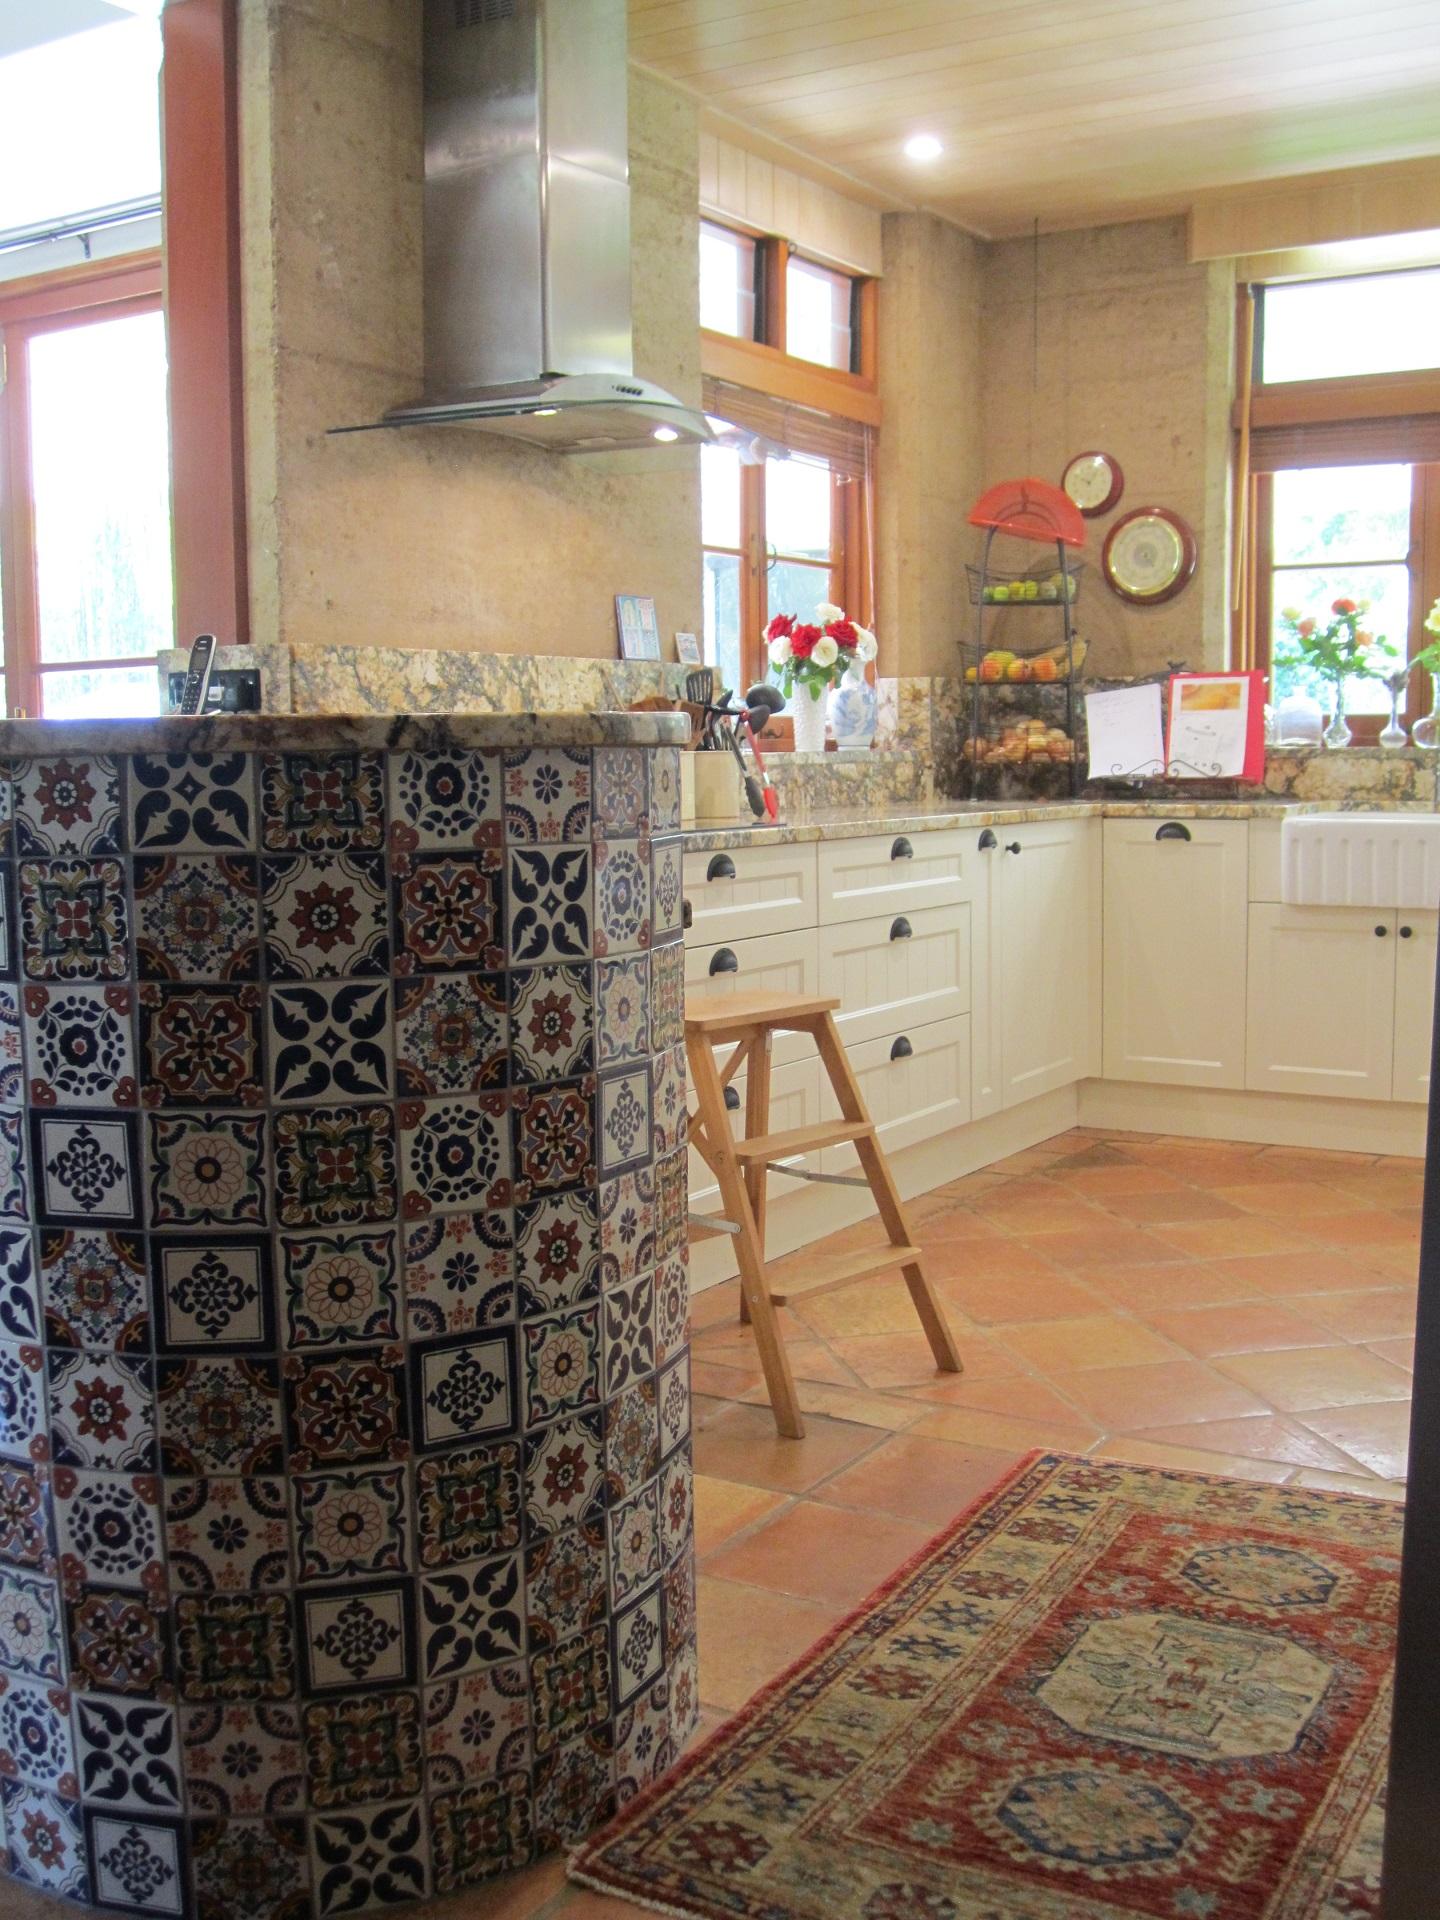 Brisbane Kitchen Design Samford  Traditional Kitchen Renovation  Curved Breakfast Bar(2)